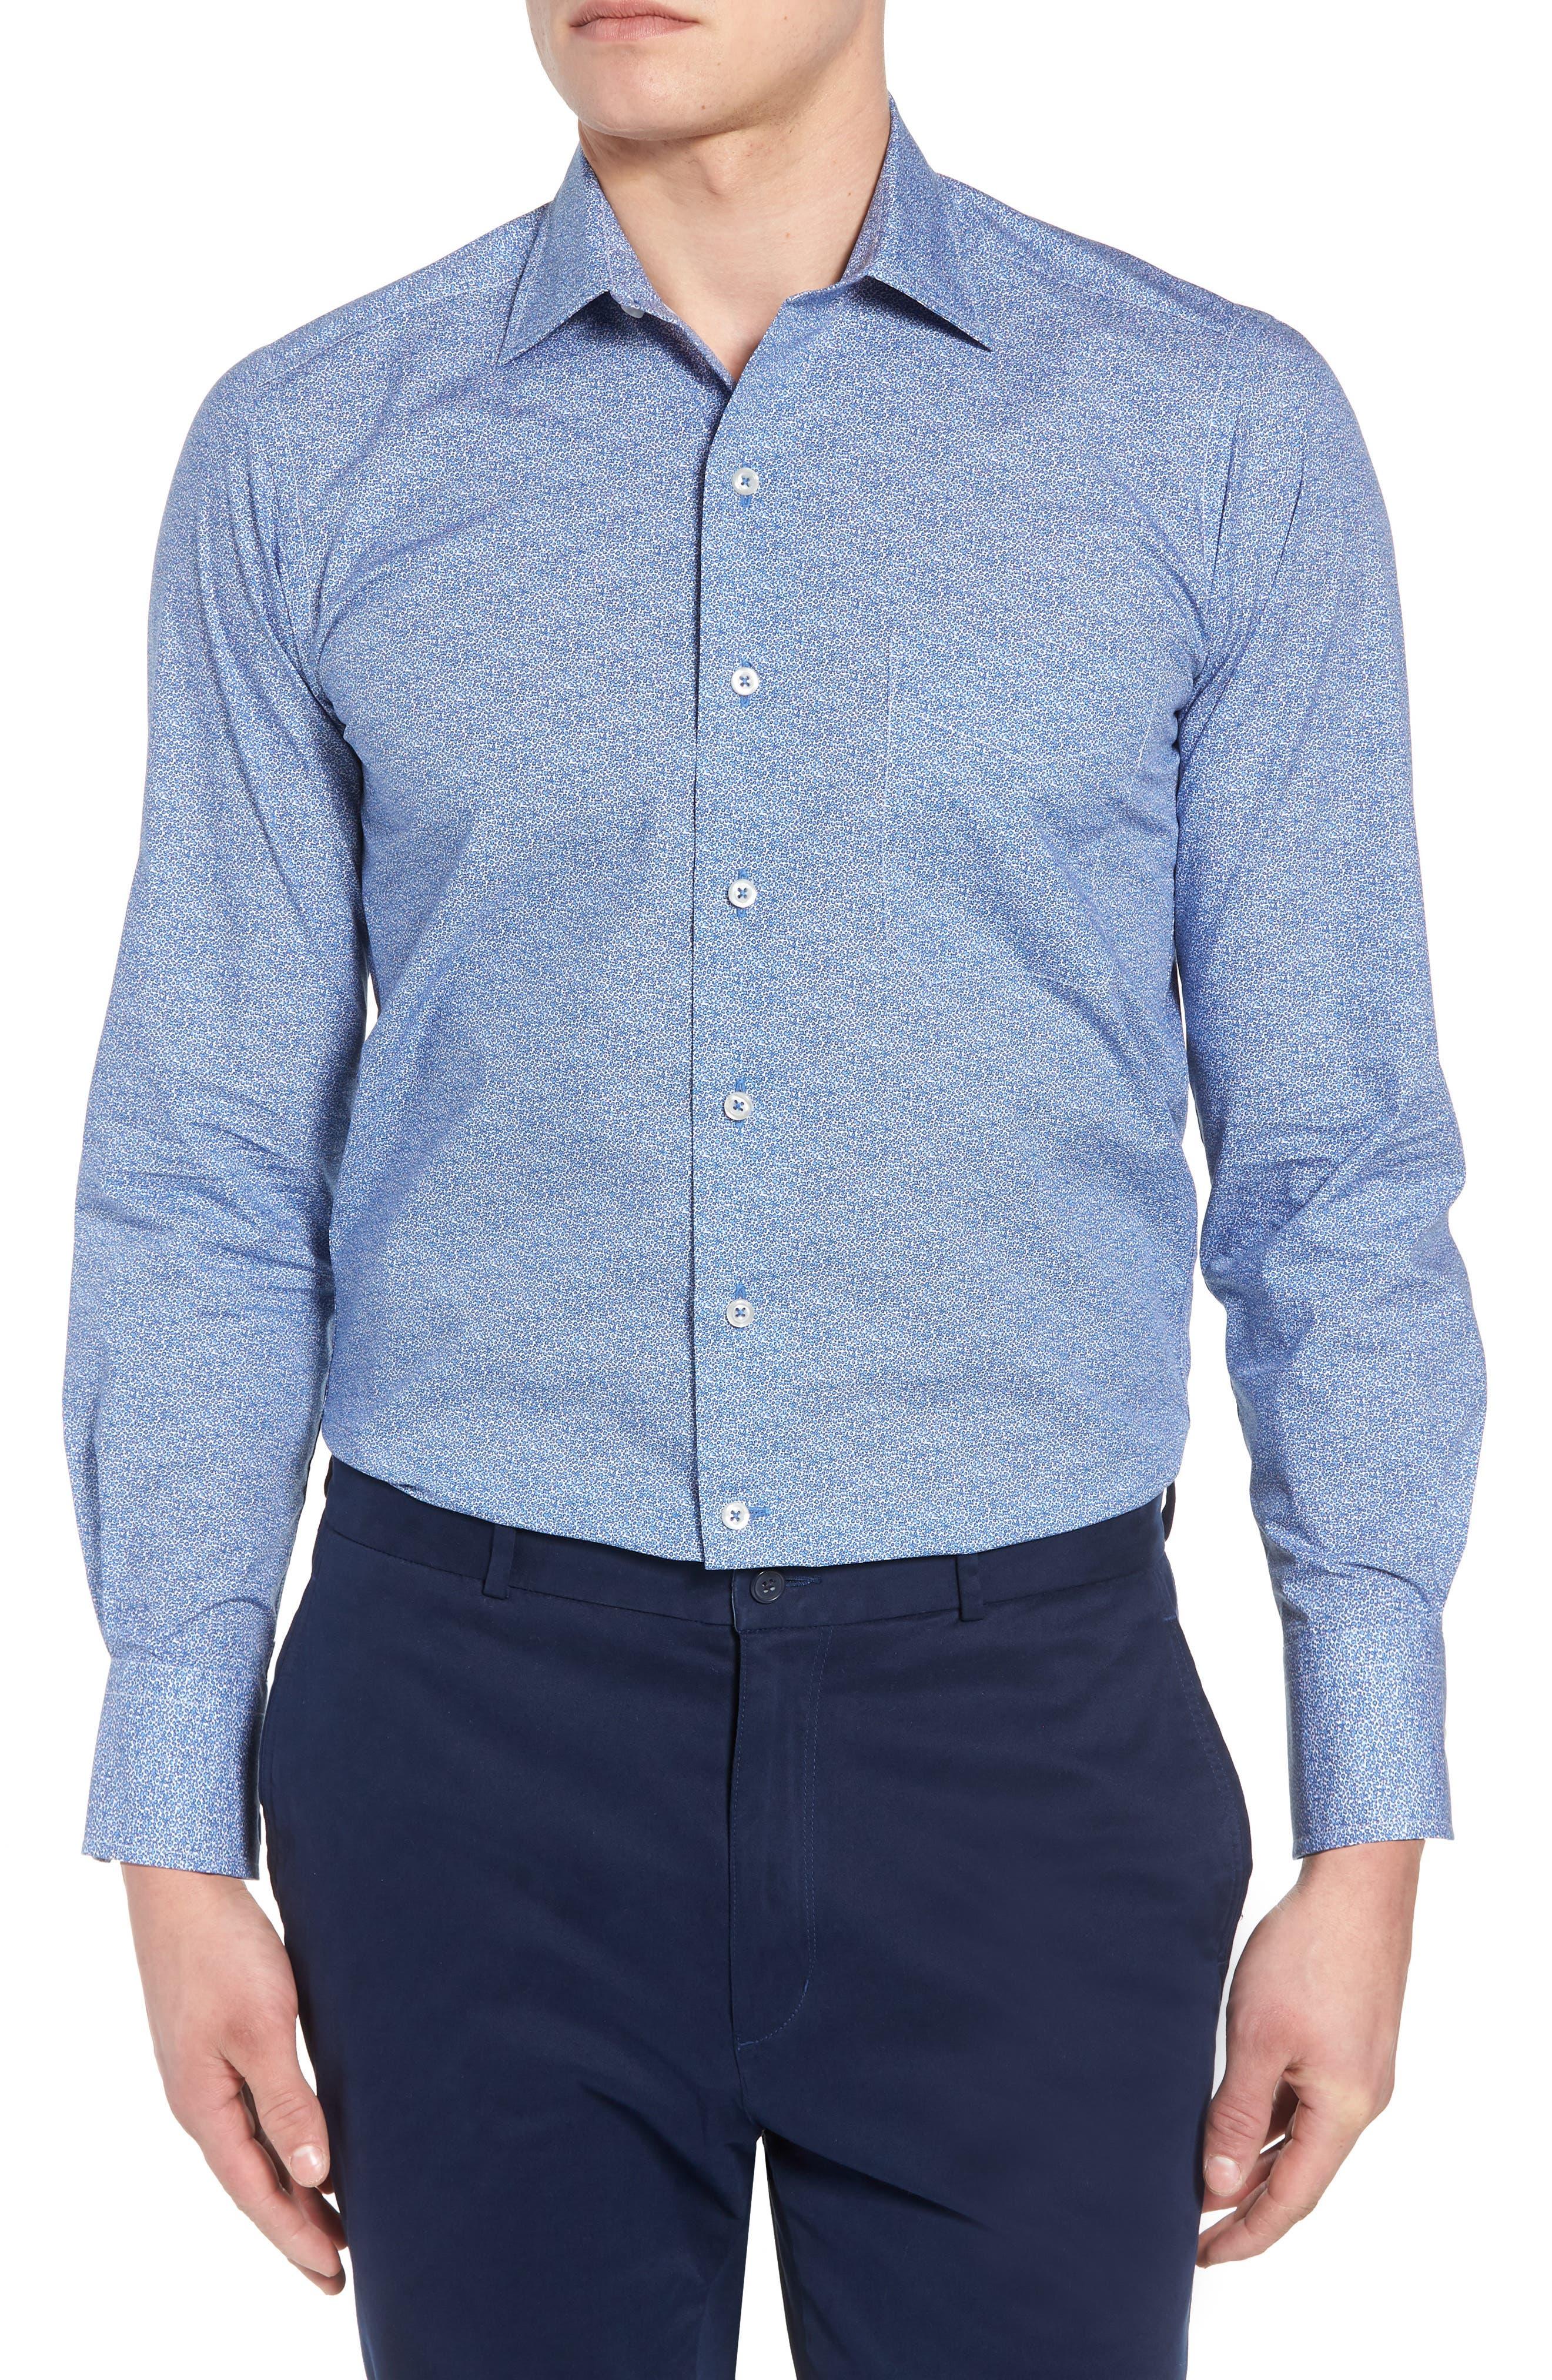 Regular Fit Microprint Sport Shirt,                             Main thumbnail 1, color,                             Blue